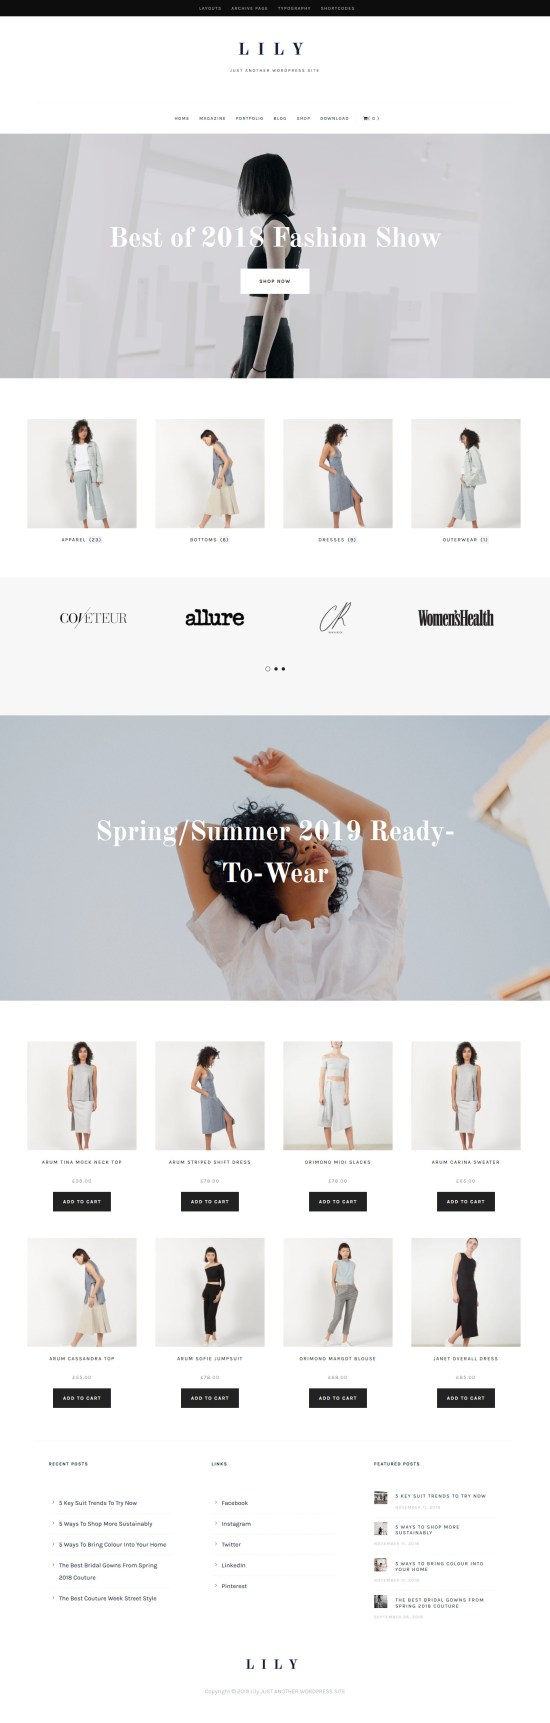 lily wordpress theme 01 - Lily WordPress Theme